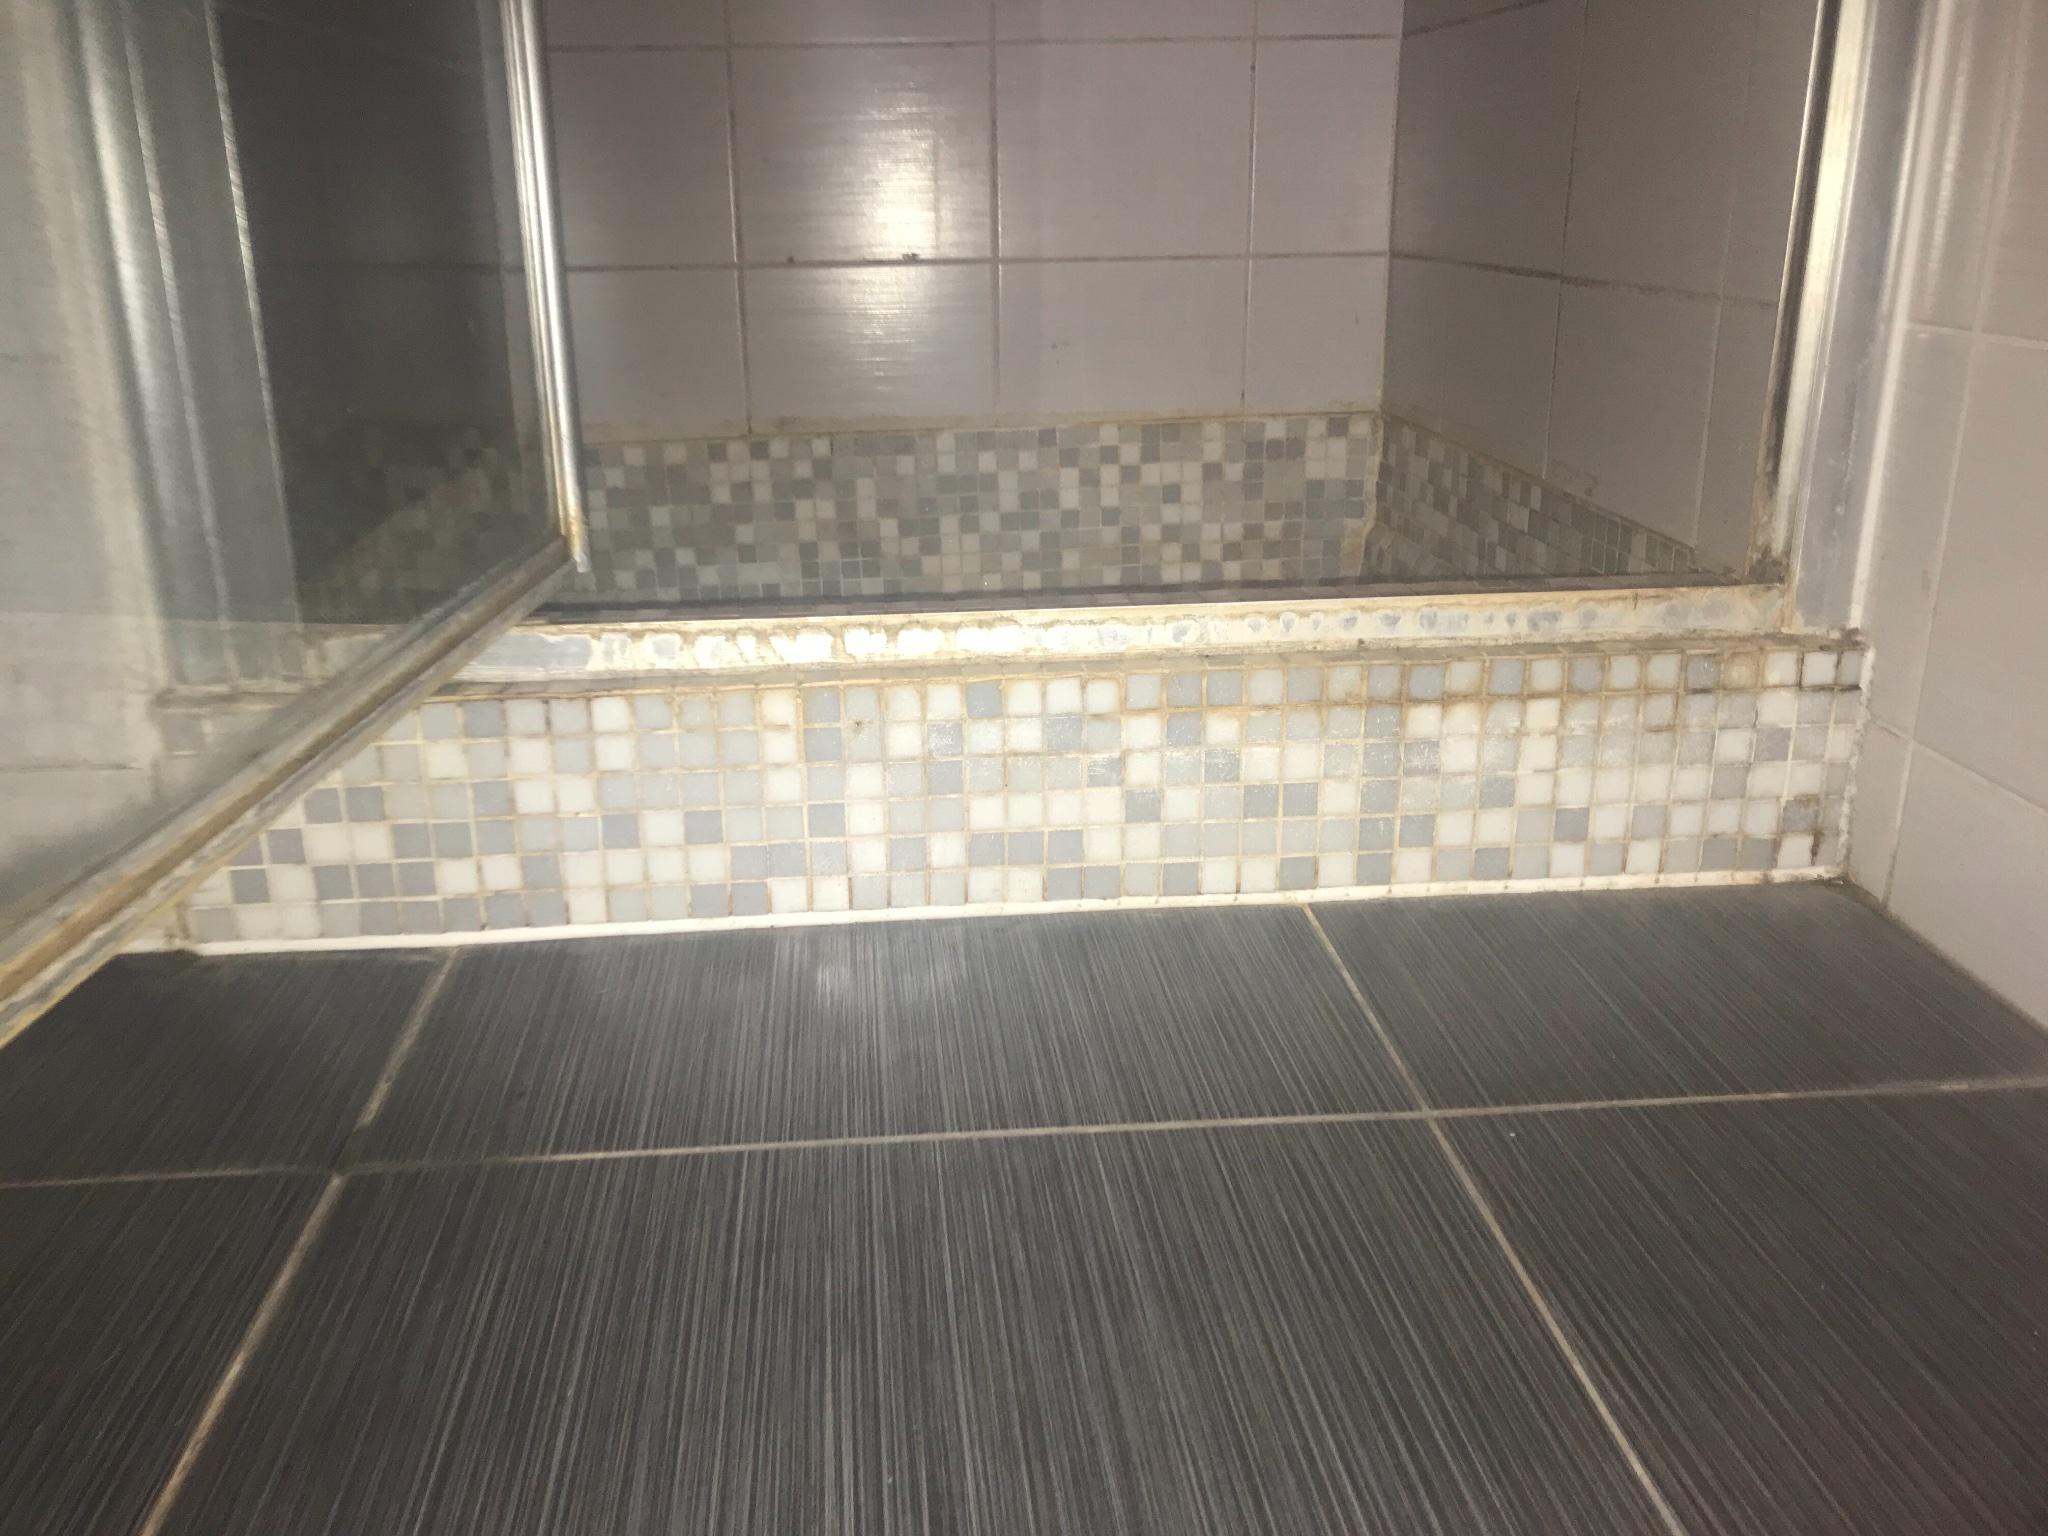 Badkamer Mozaiek Tegels : Badkamer mozaiek tegels vervangen werkspot